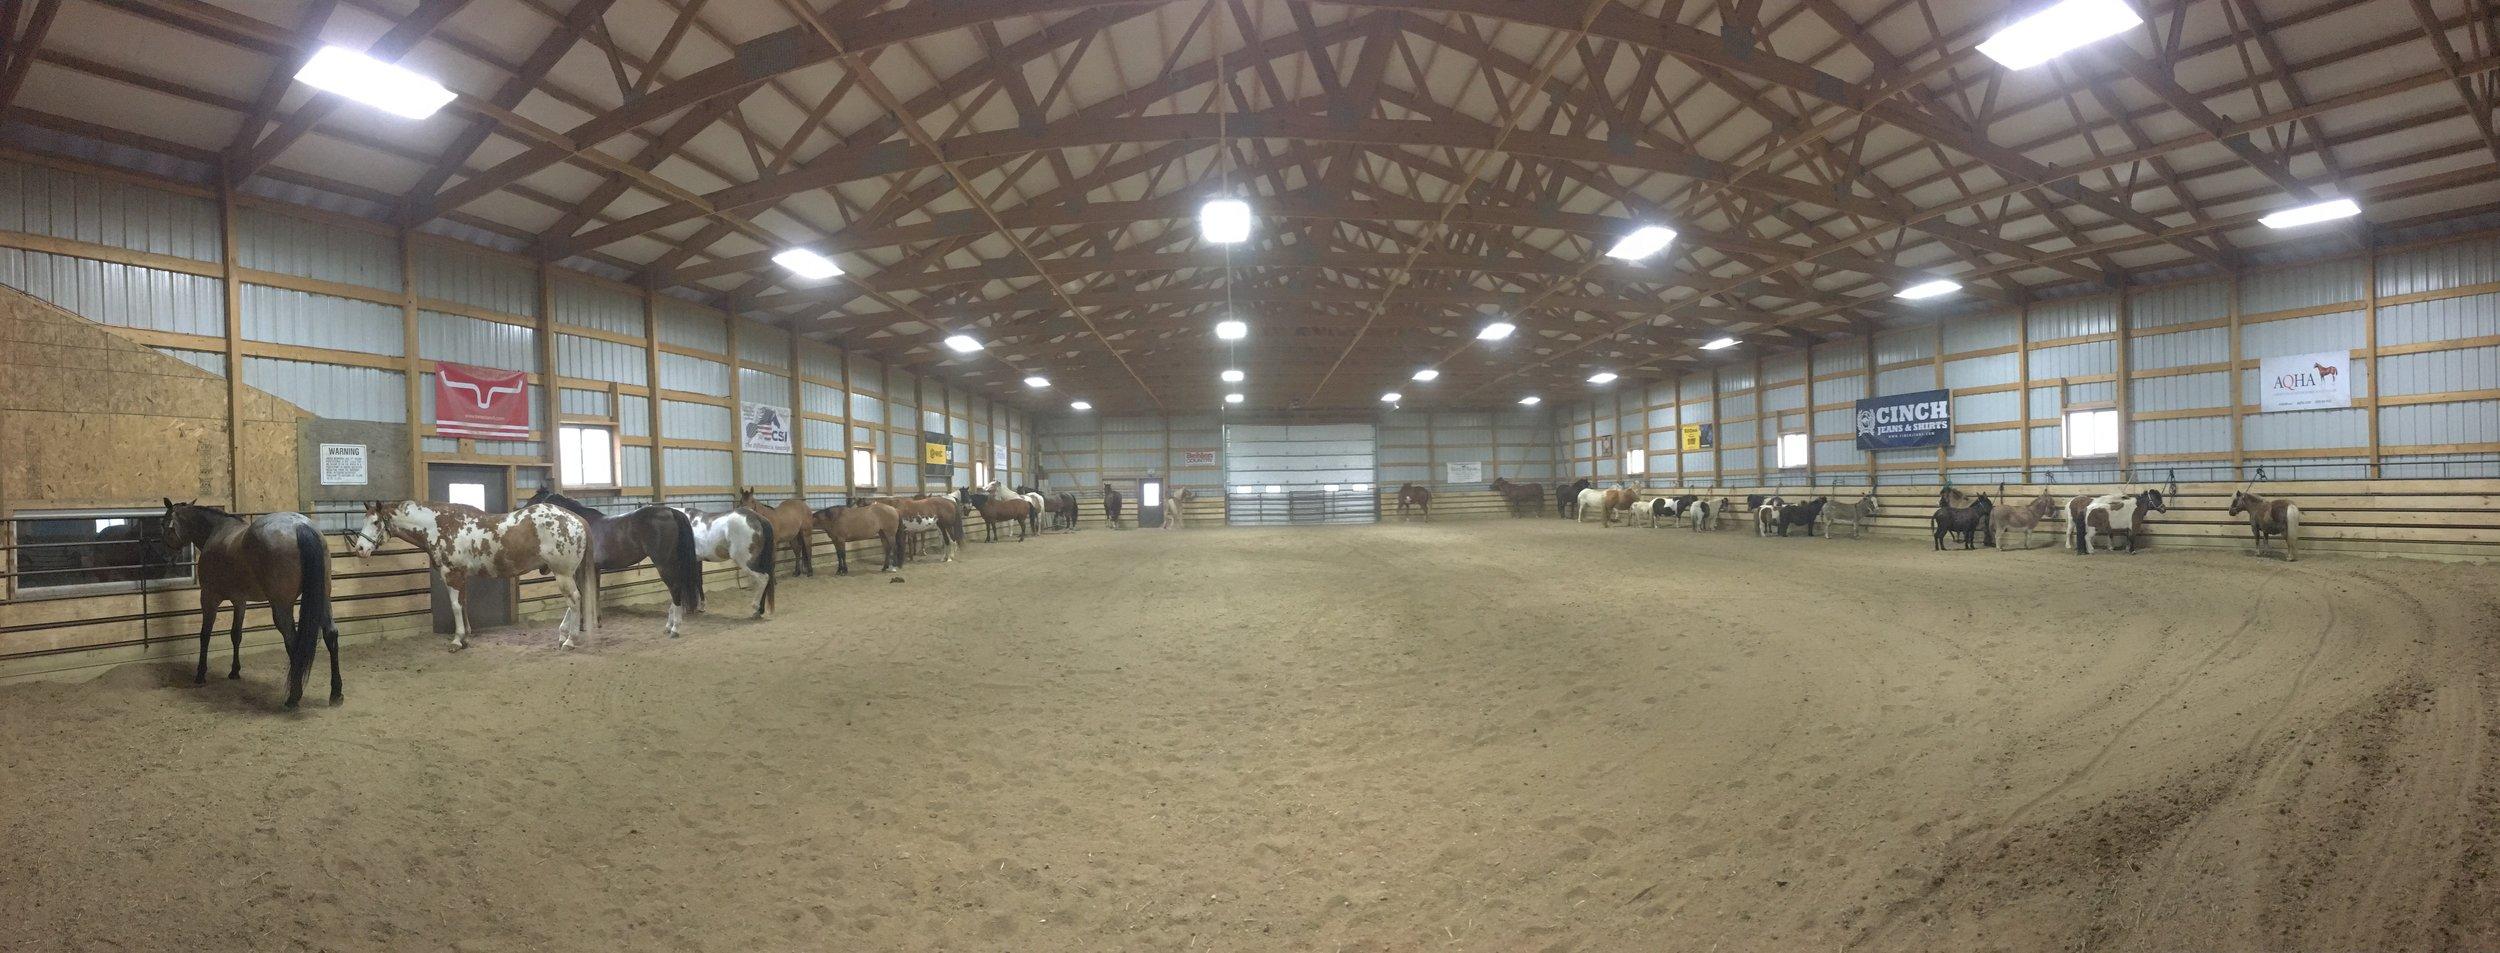 full arena.jpeg